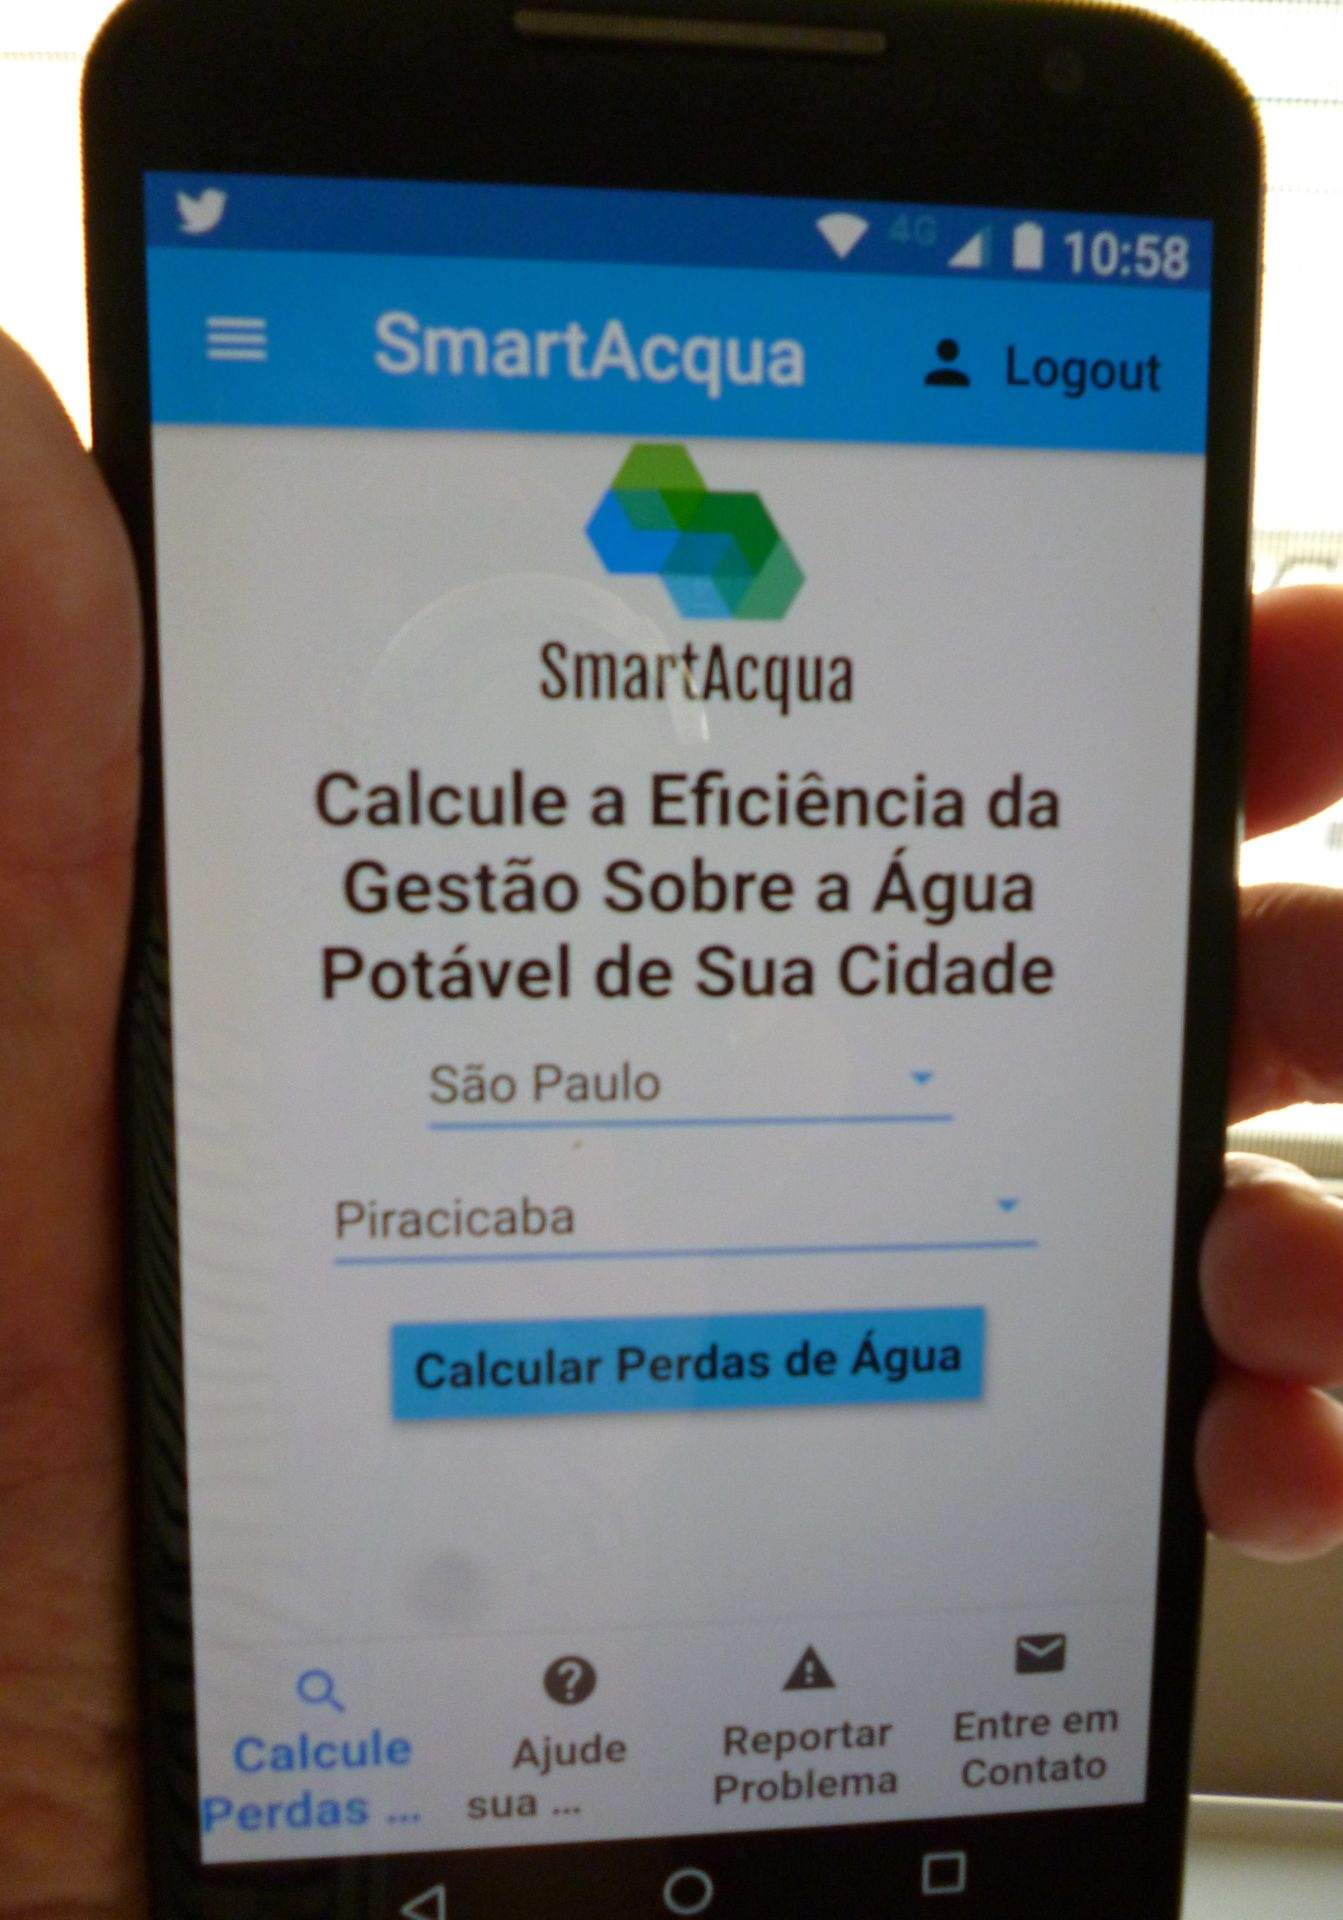 SmartAcqua